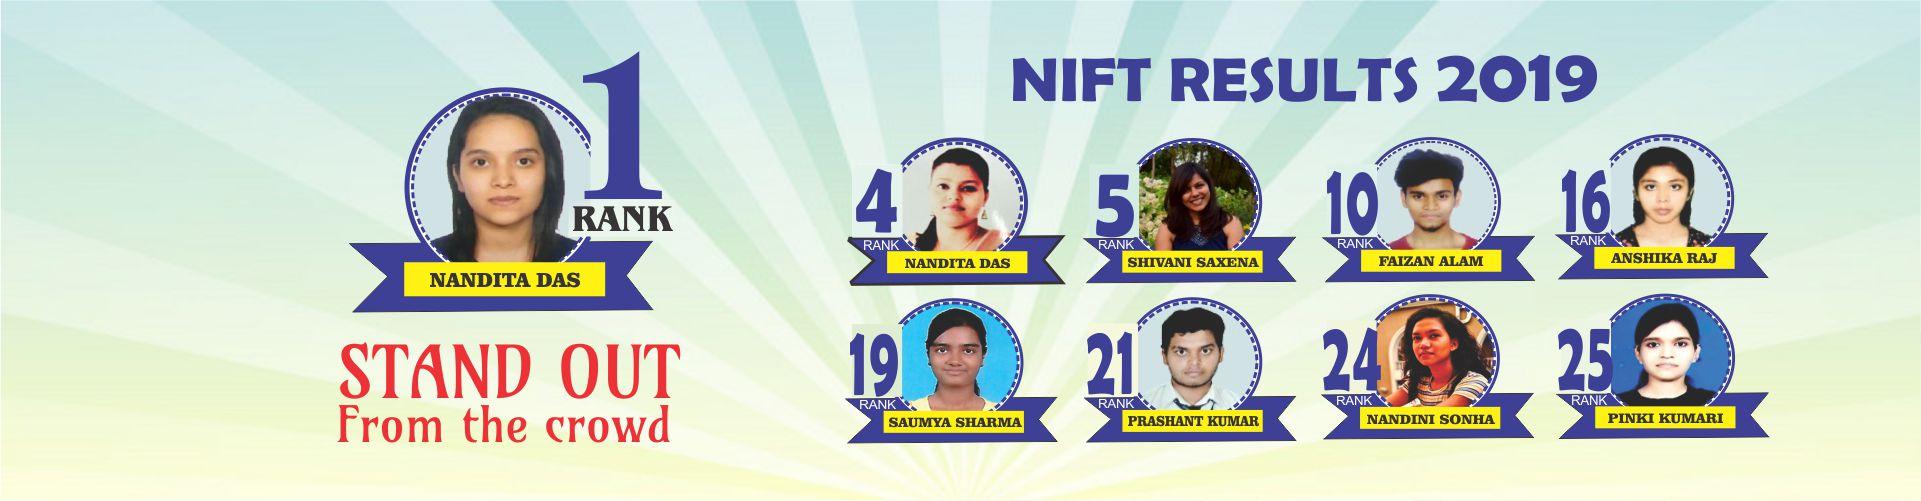 NIFT 2019 RANK